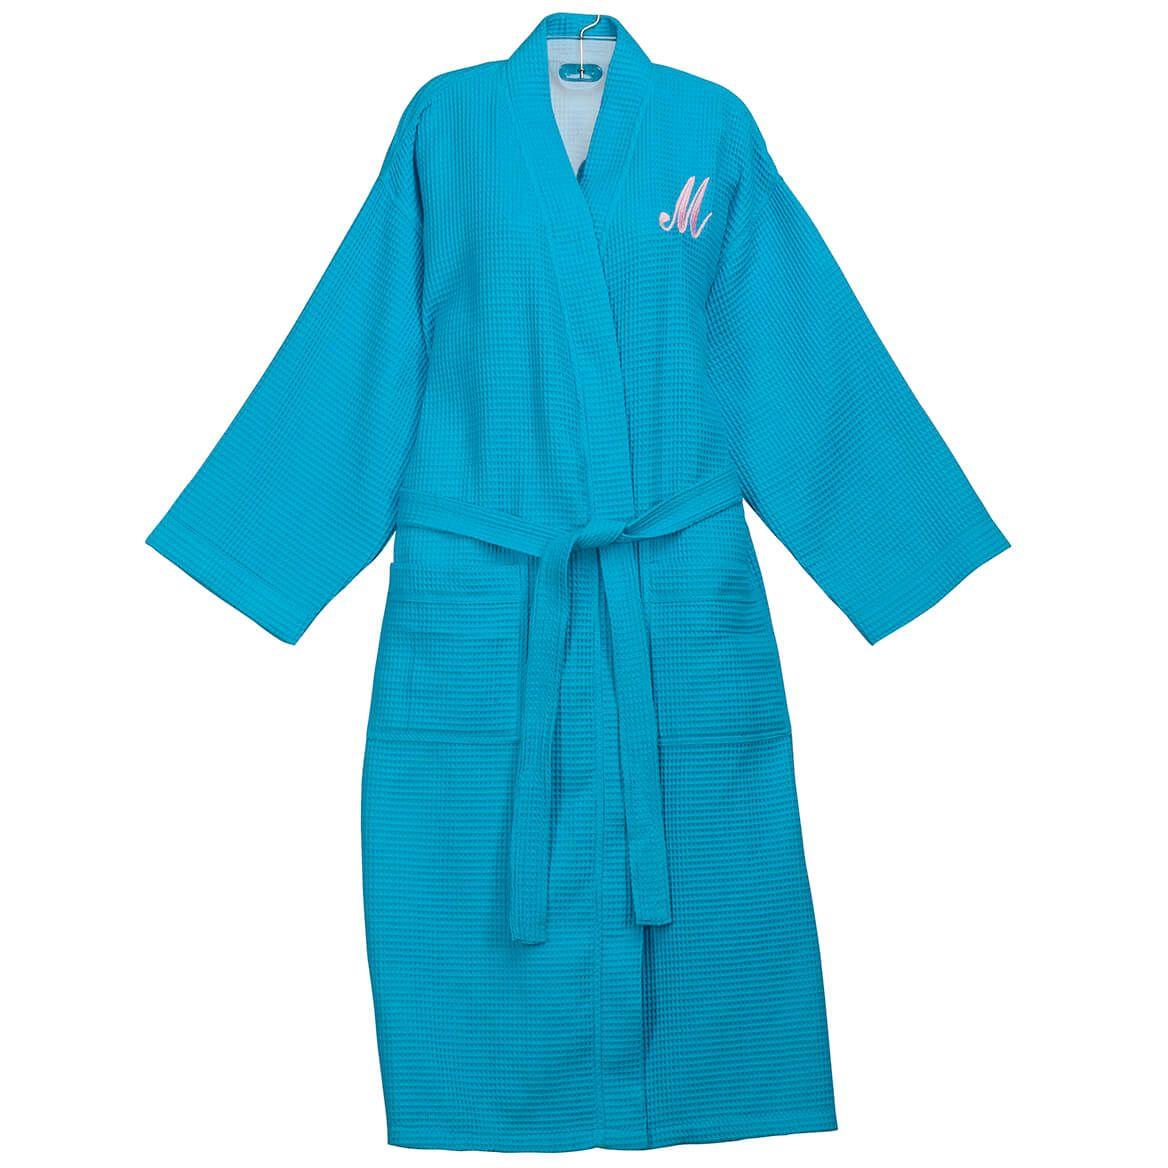 Personalized Waffle Robe Long by Sawyer Creek-359314